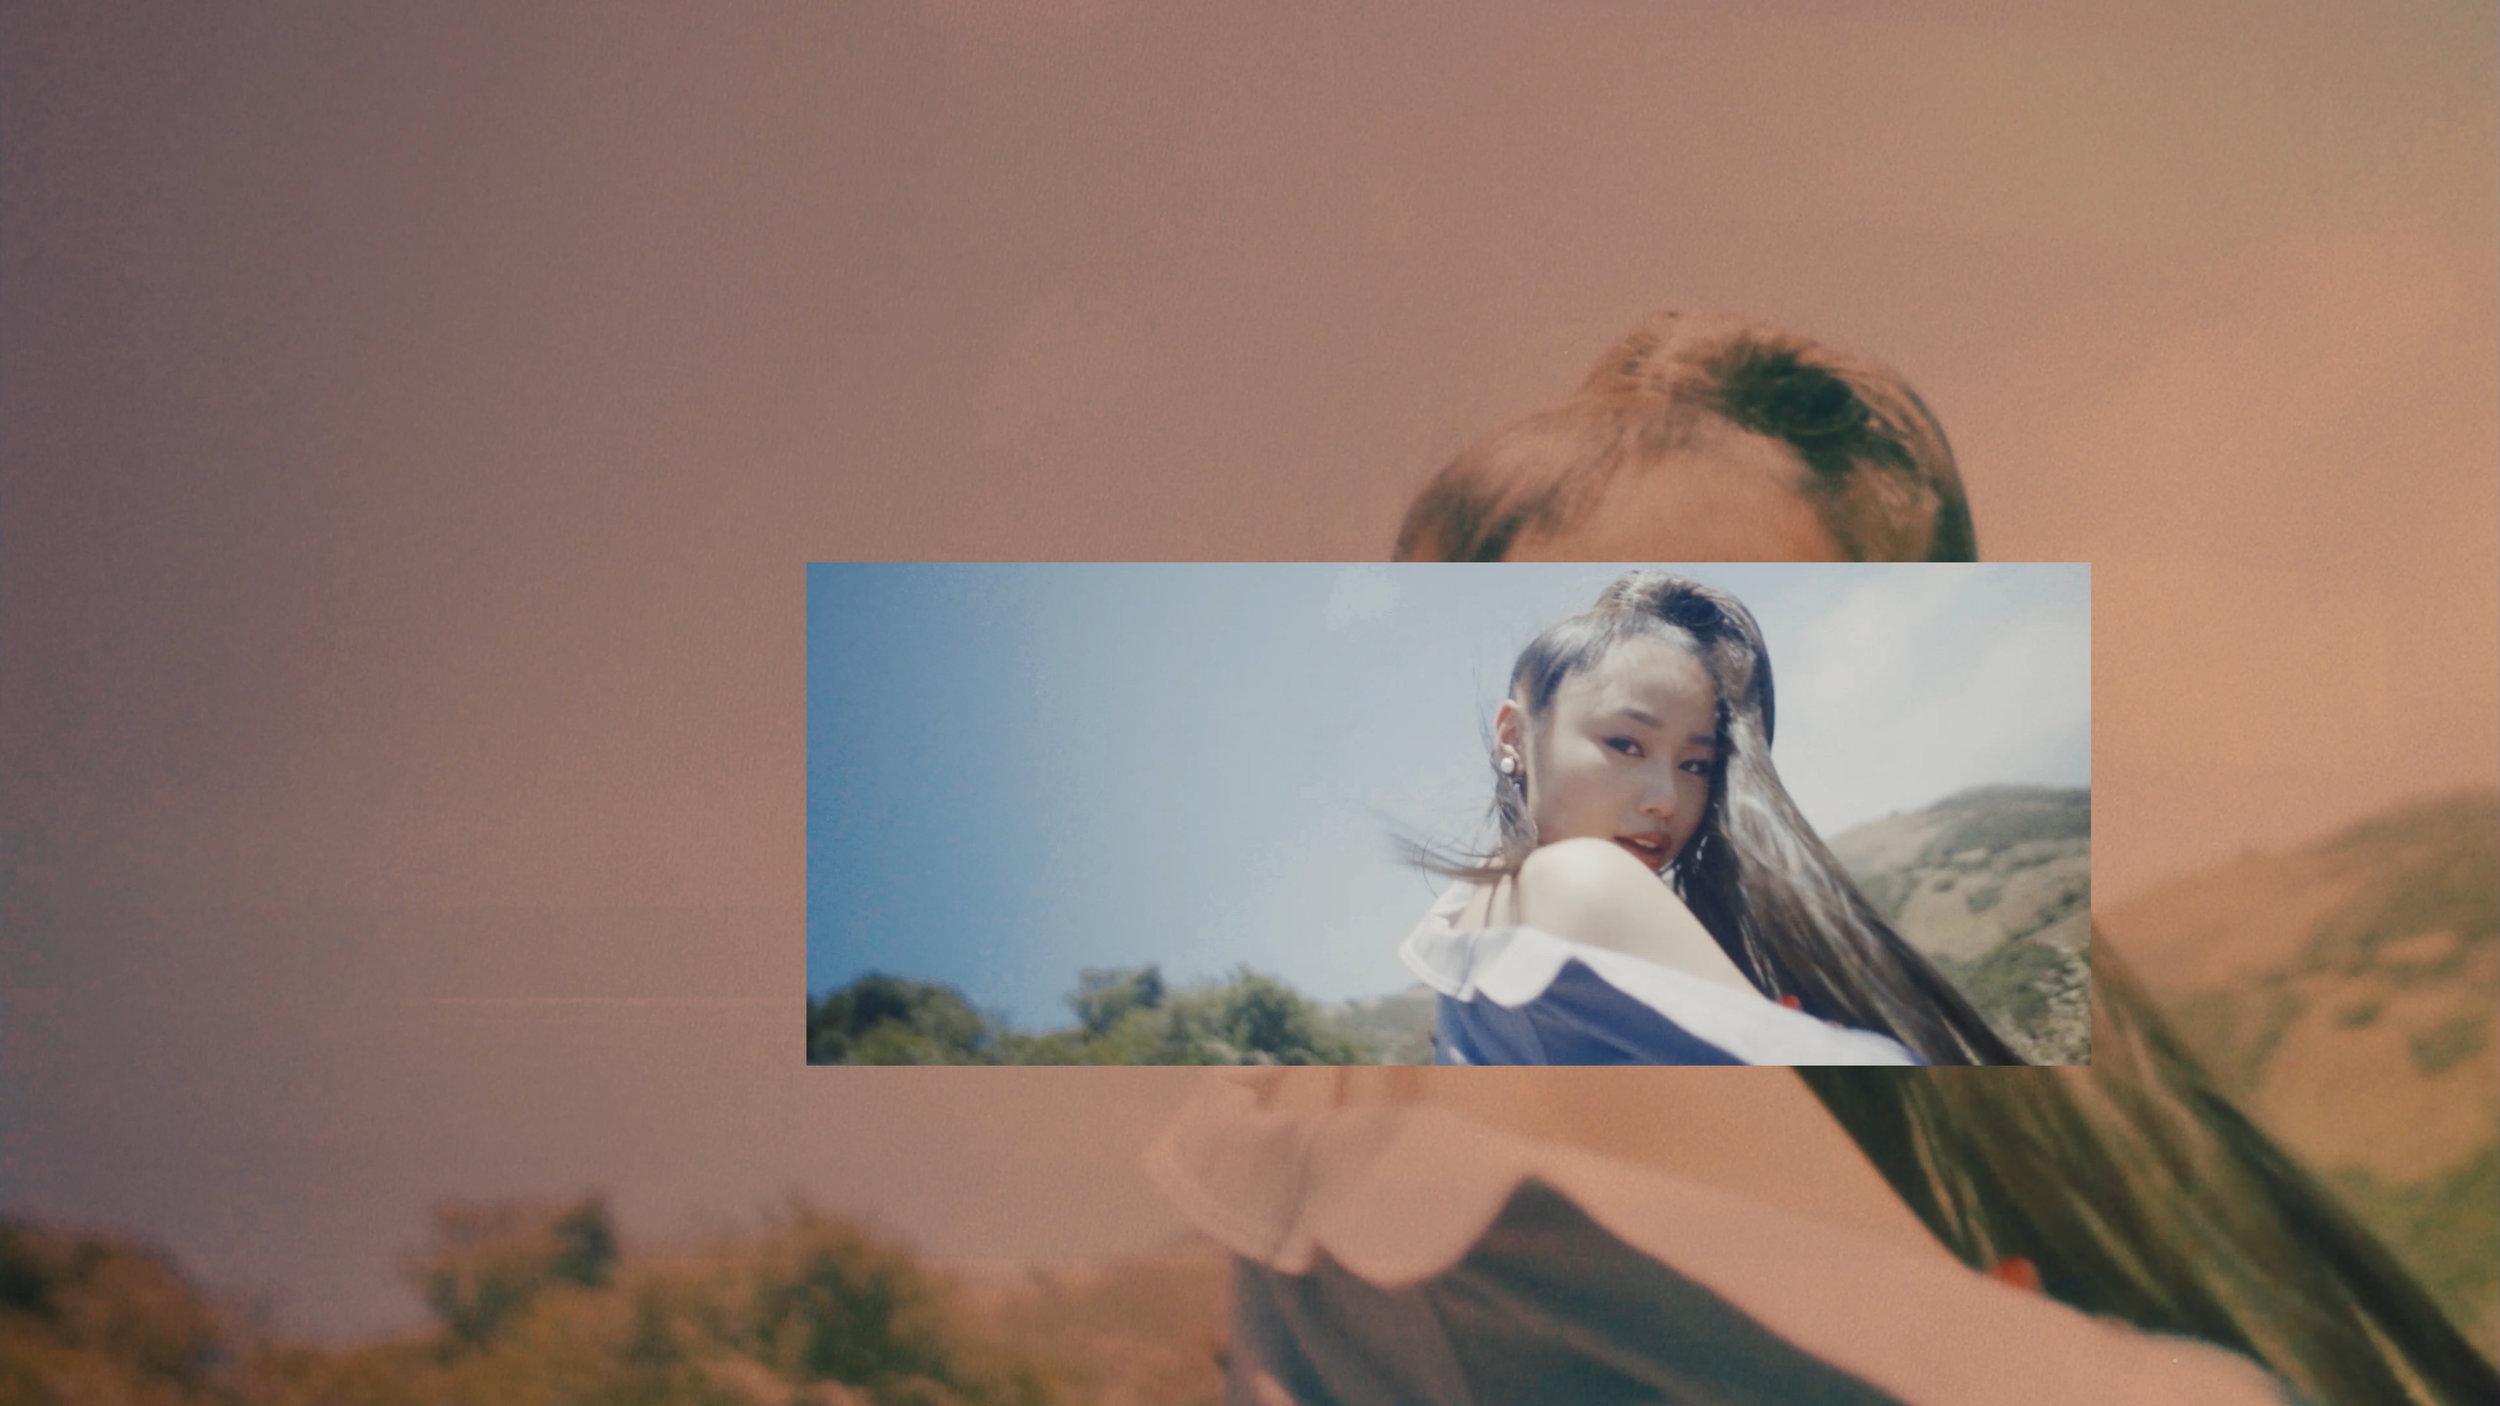 riri tumblr 4.jpg